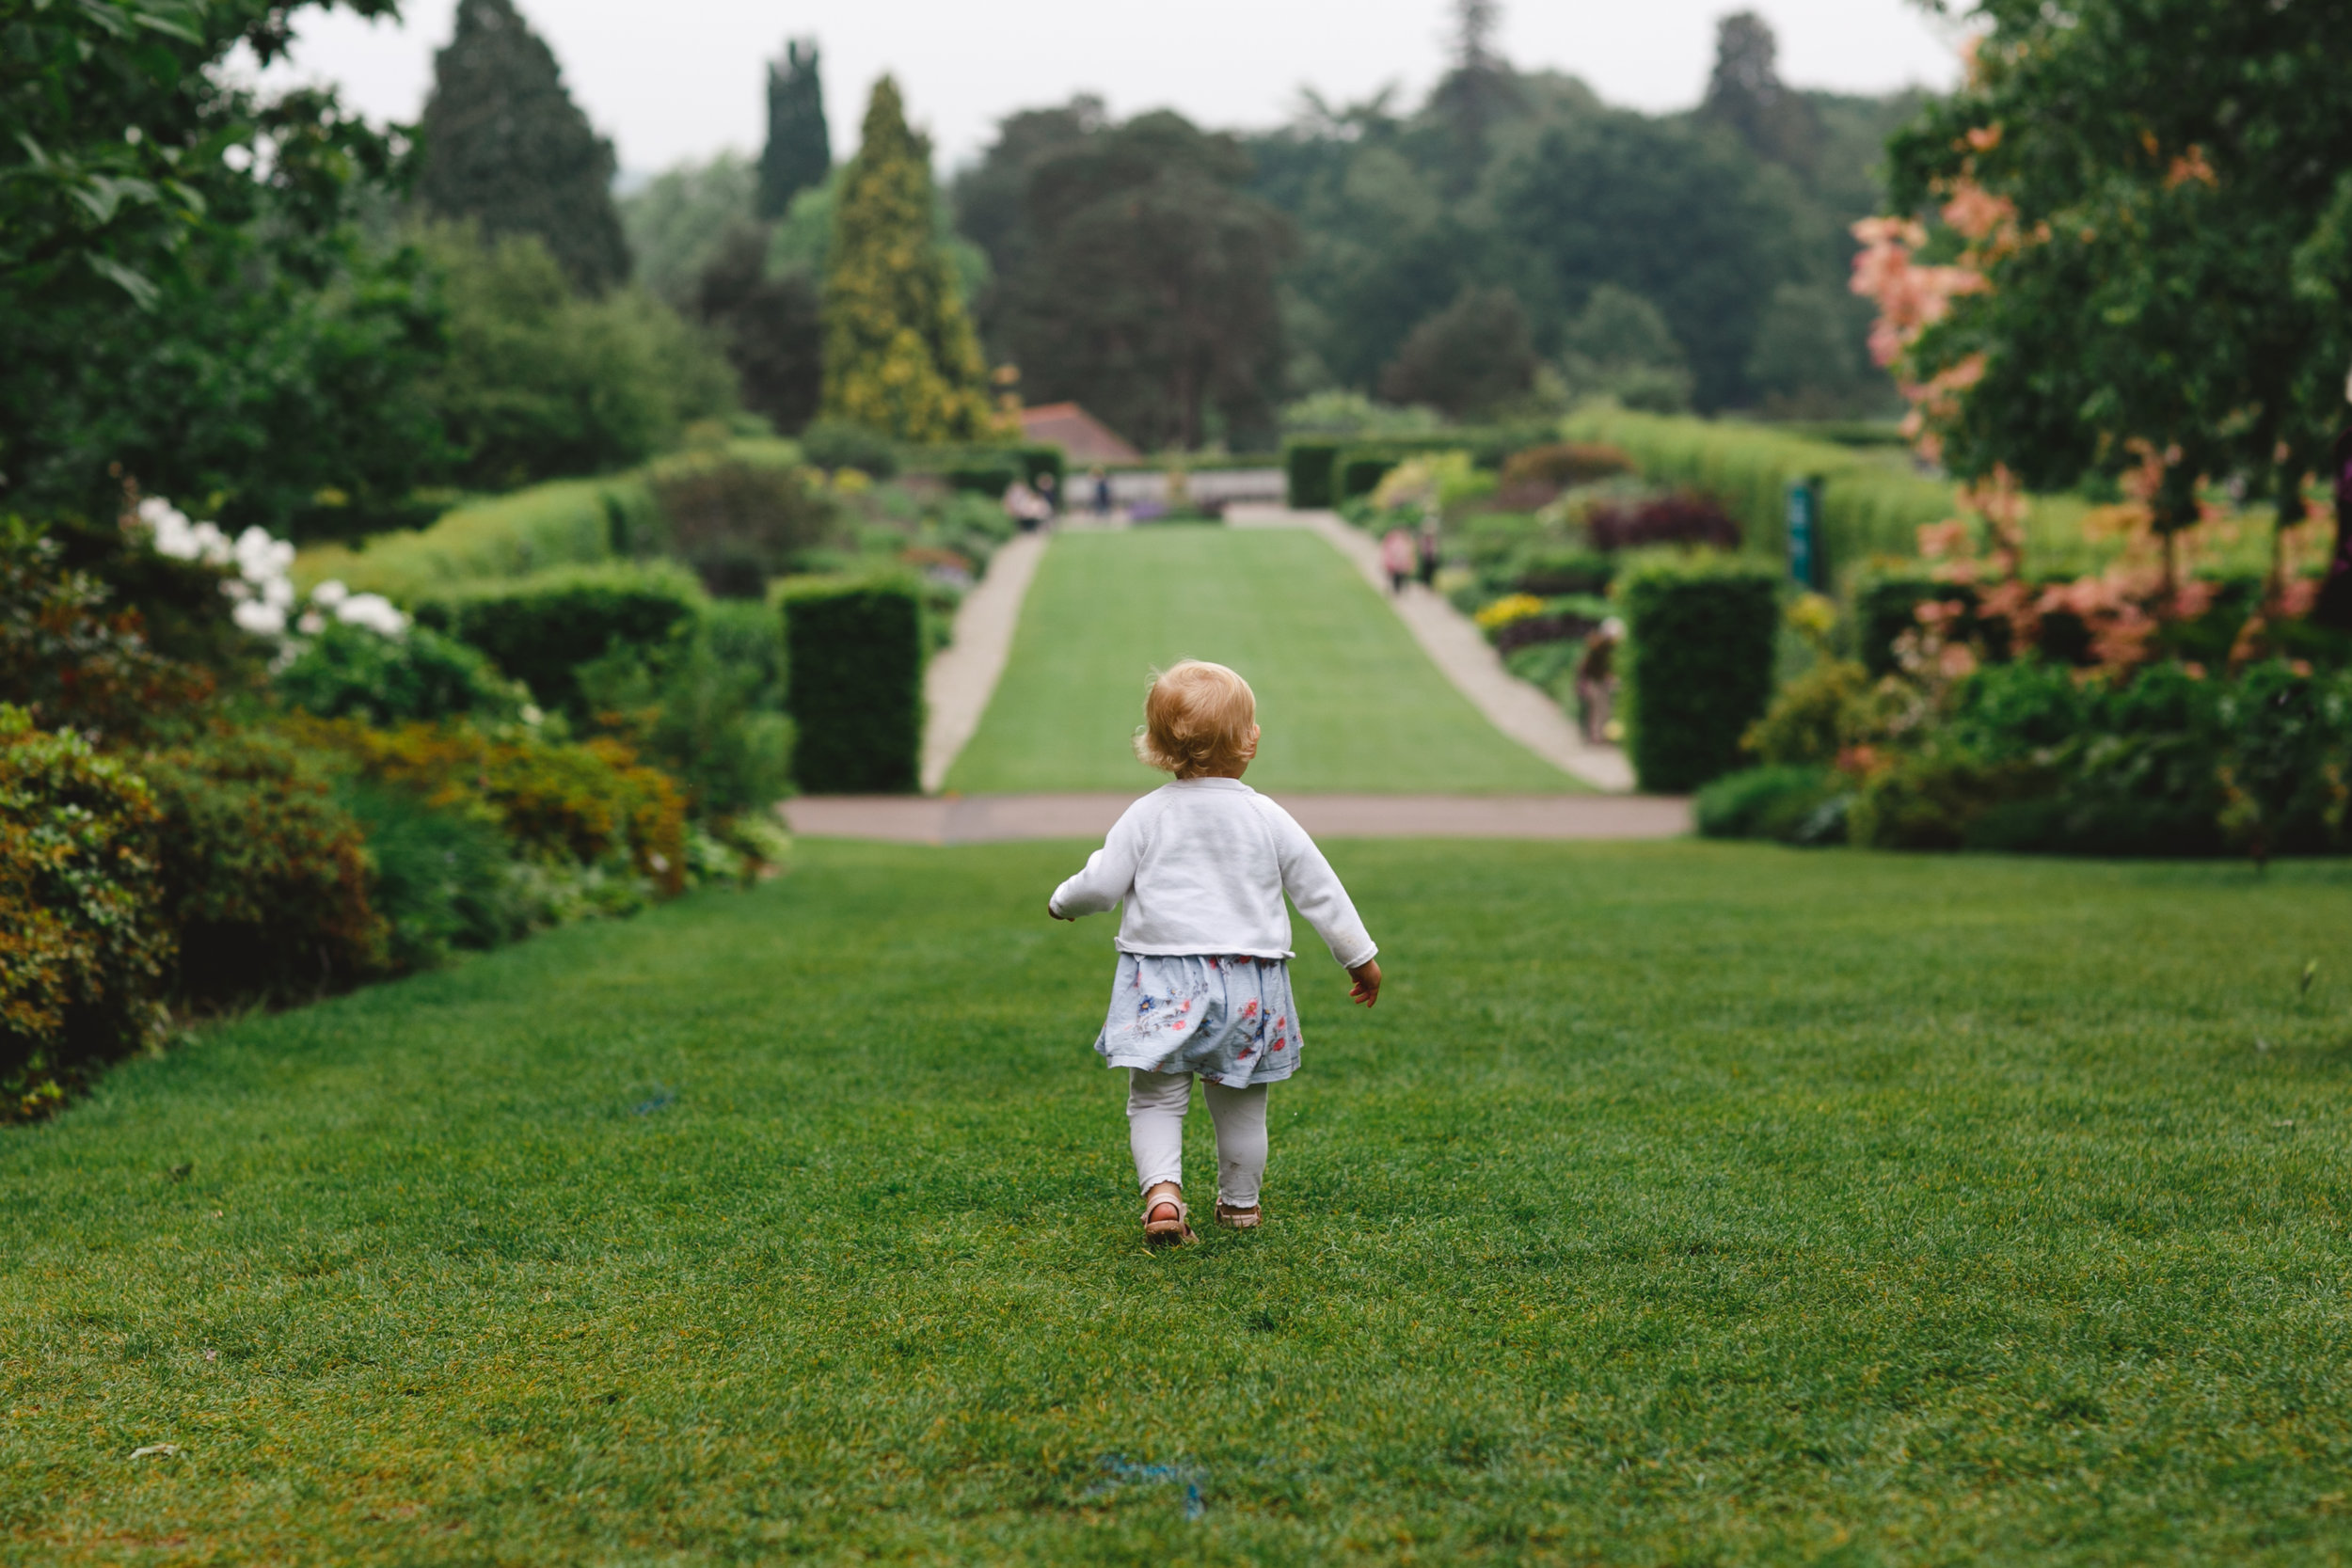 Beautiful gardens to roam in at RHS Wisley